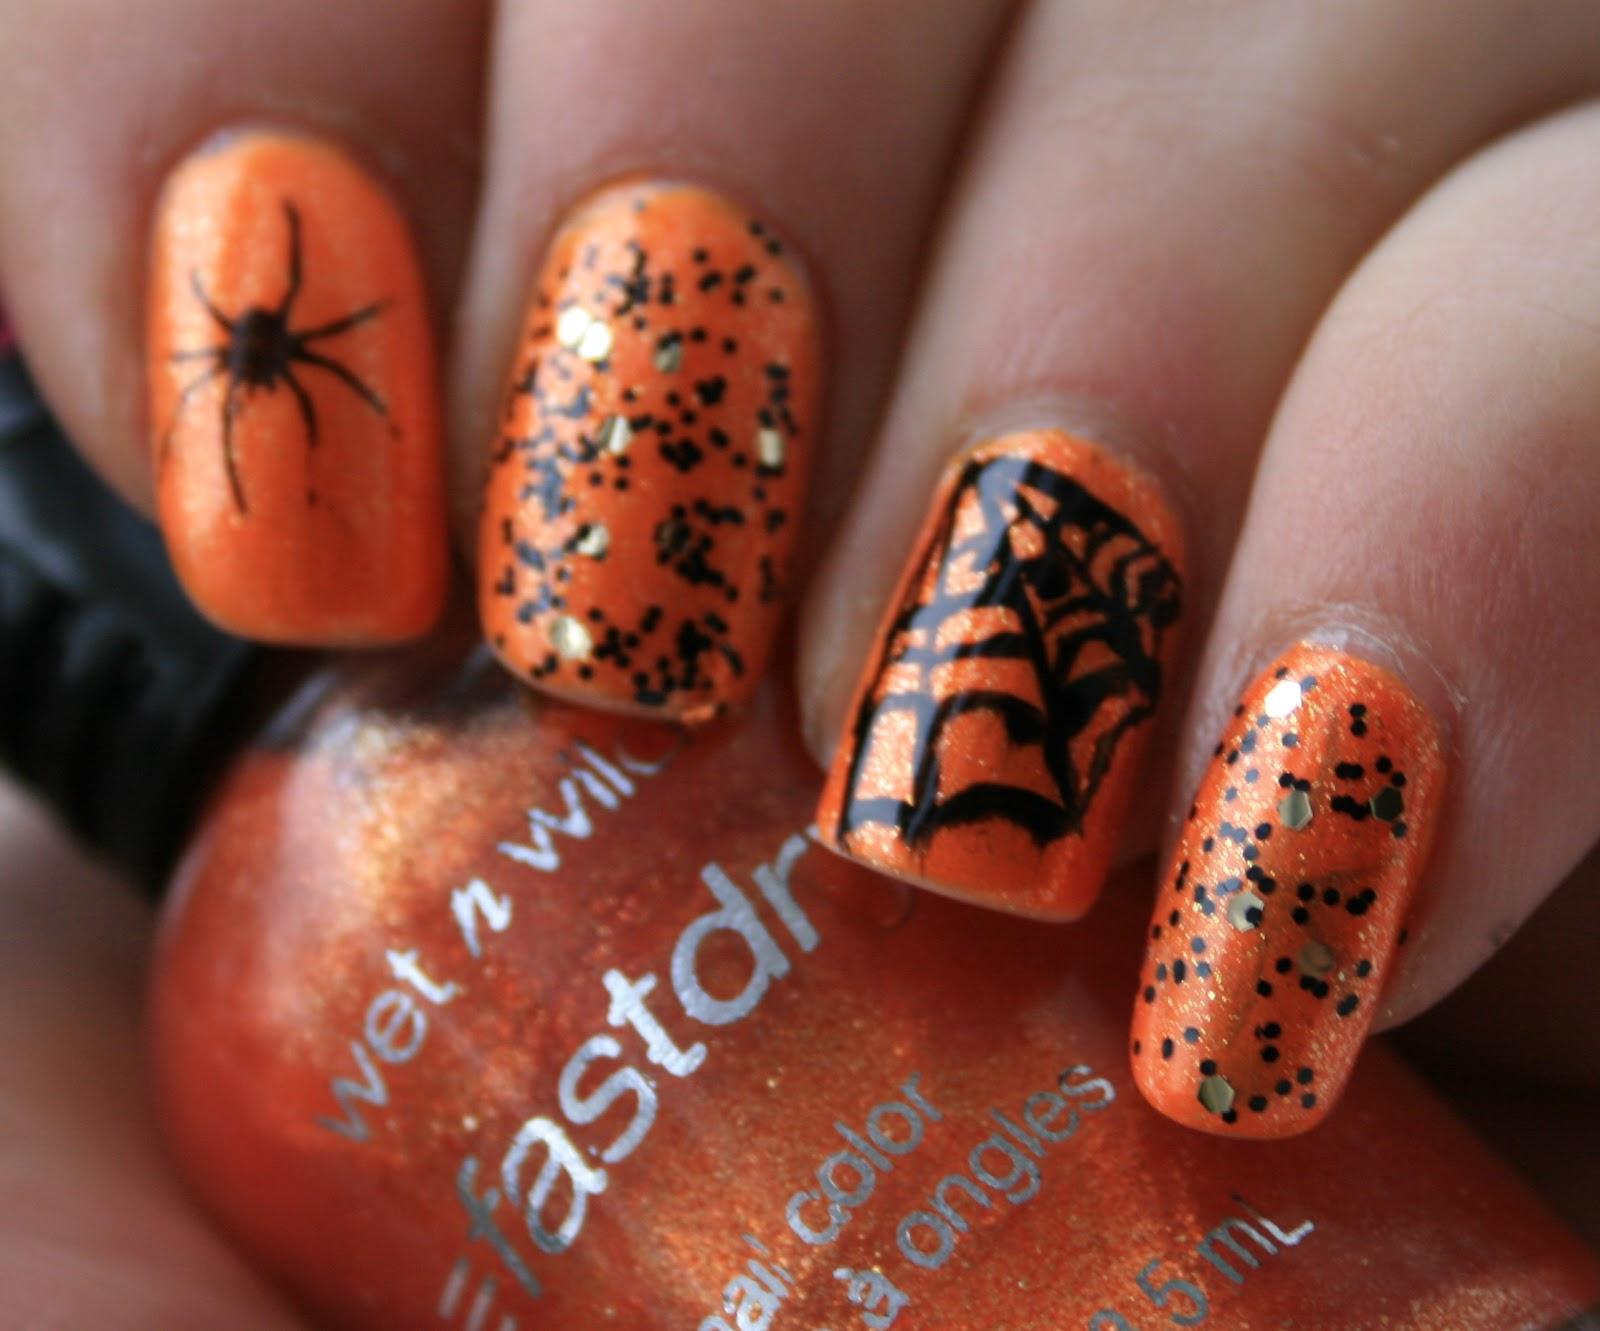 BeautyScraps: Halloween Nail Art with China Glaze Orange ...